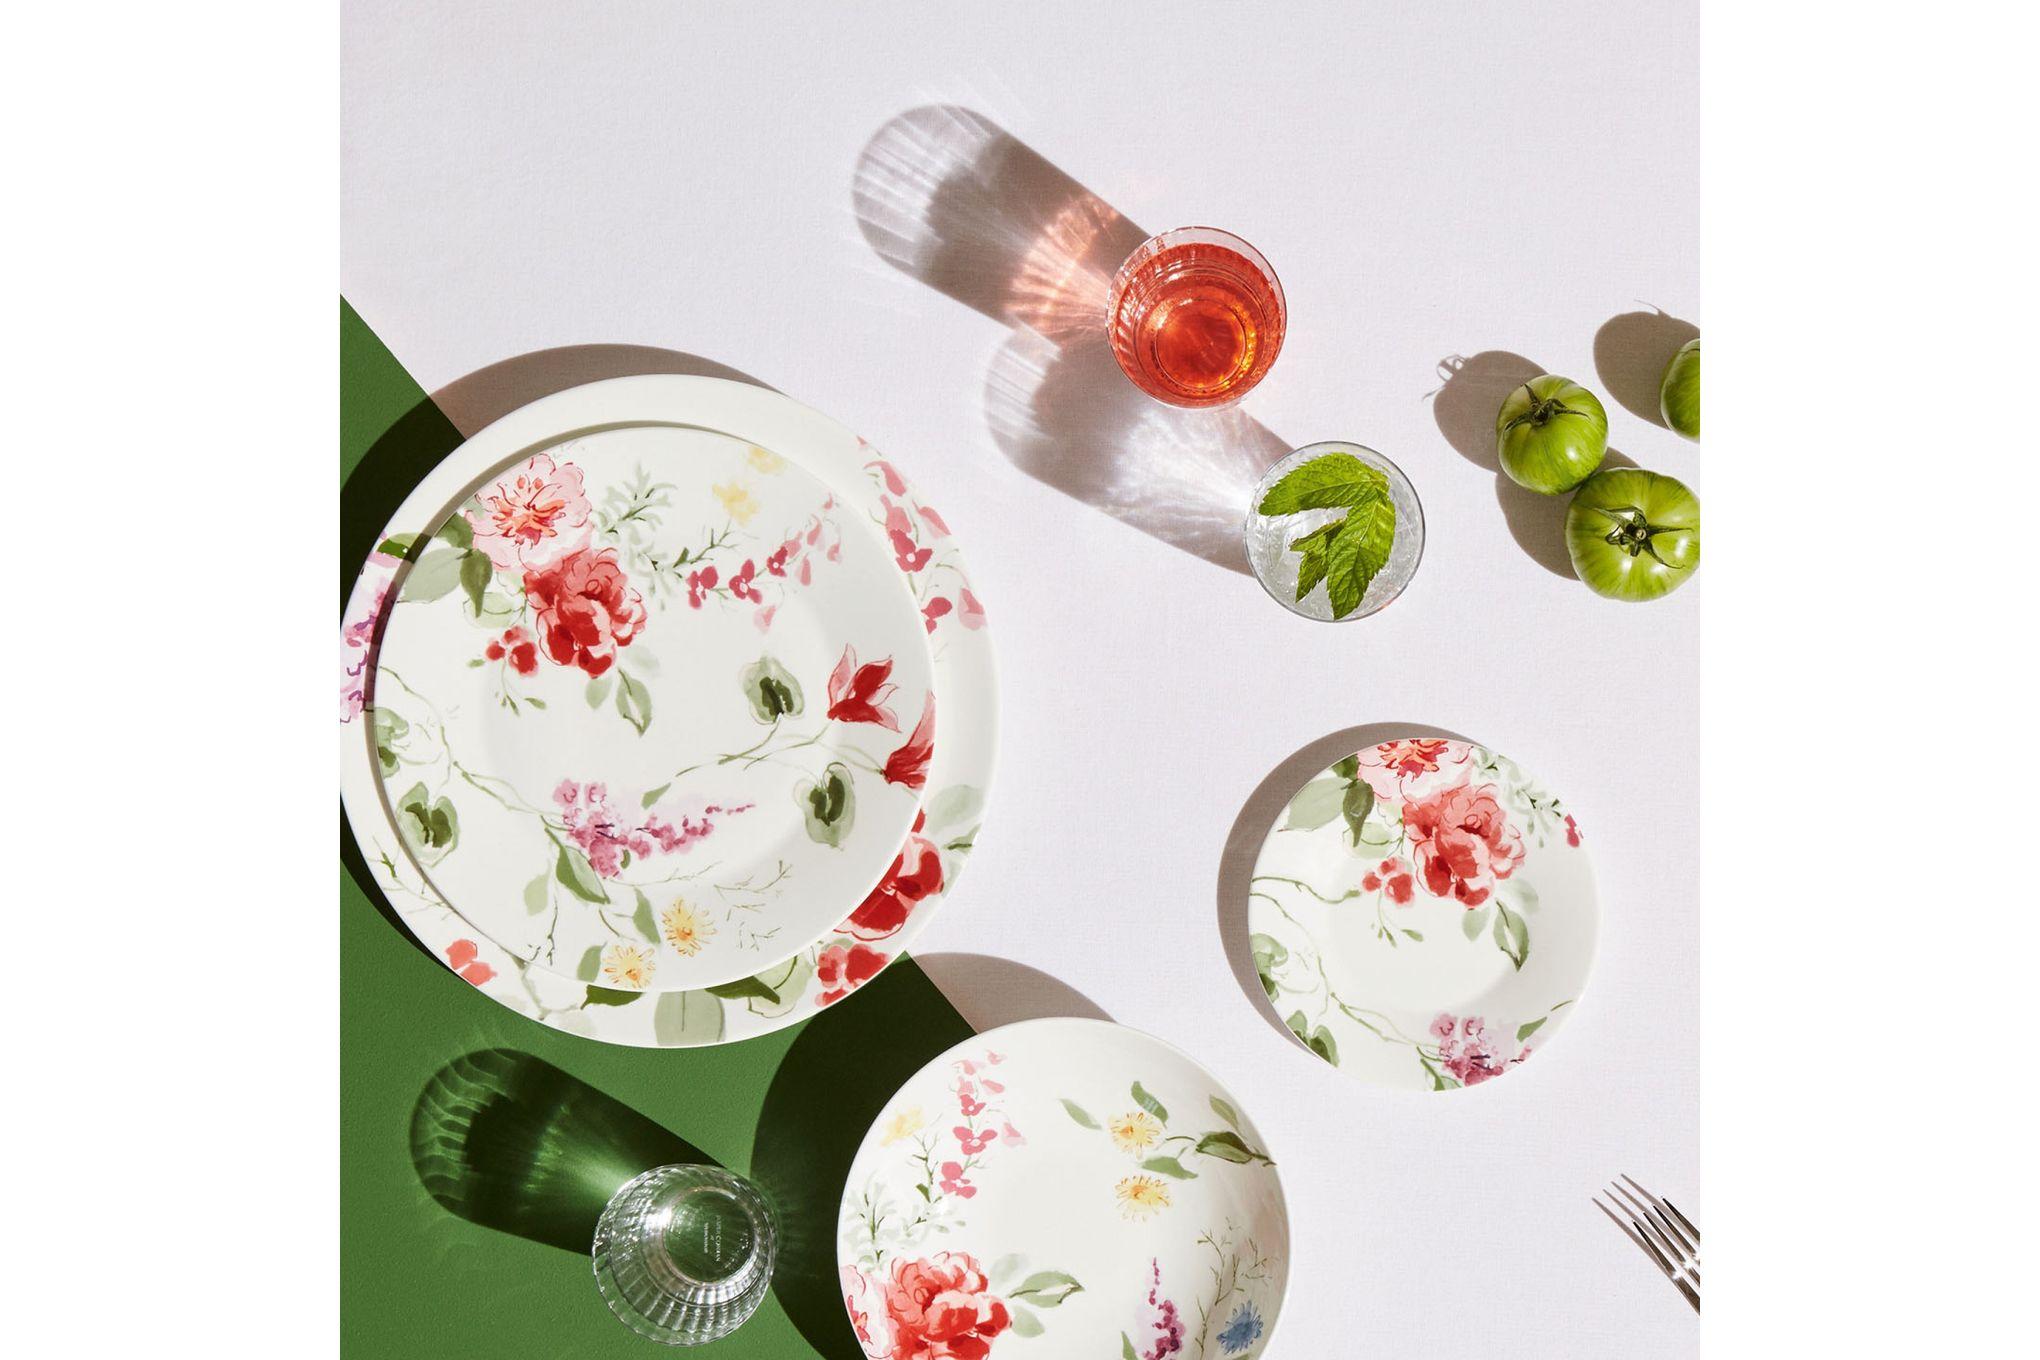 Jasper Conran for Wedgwood Floral Dinner Plate 27cm thumb 2